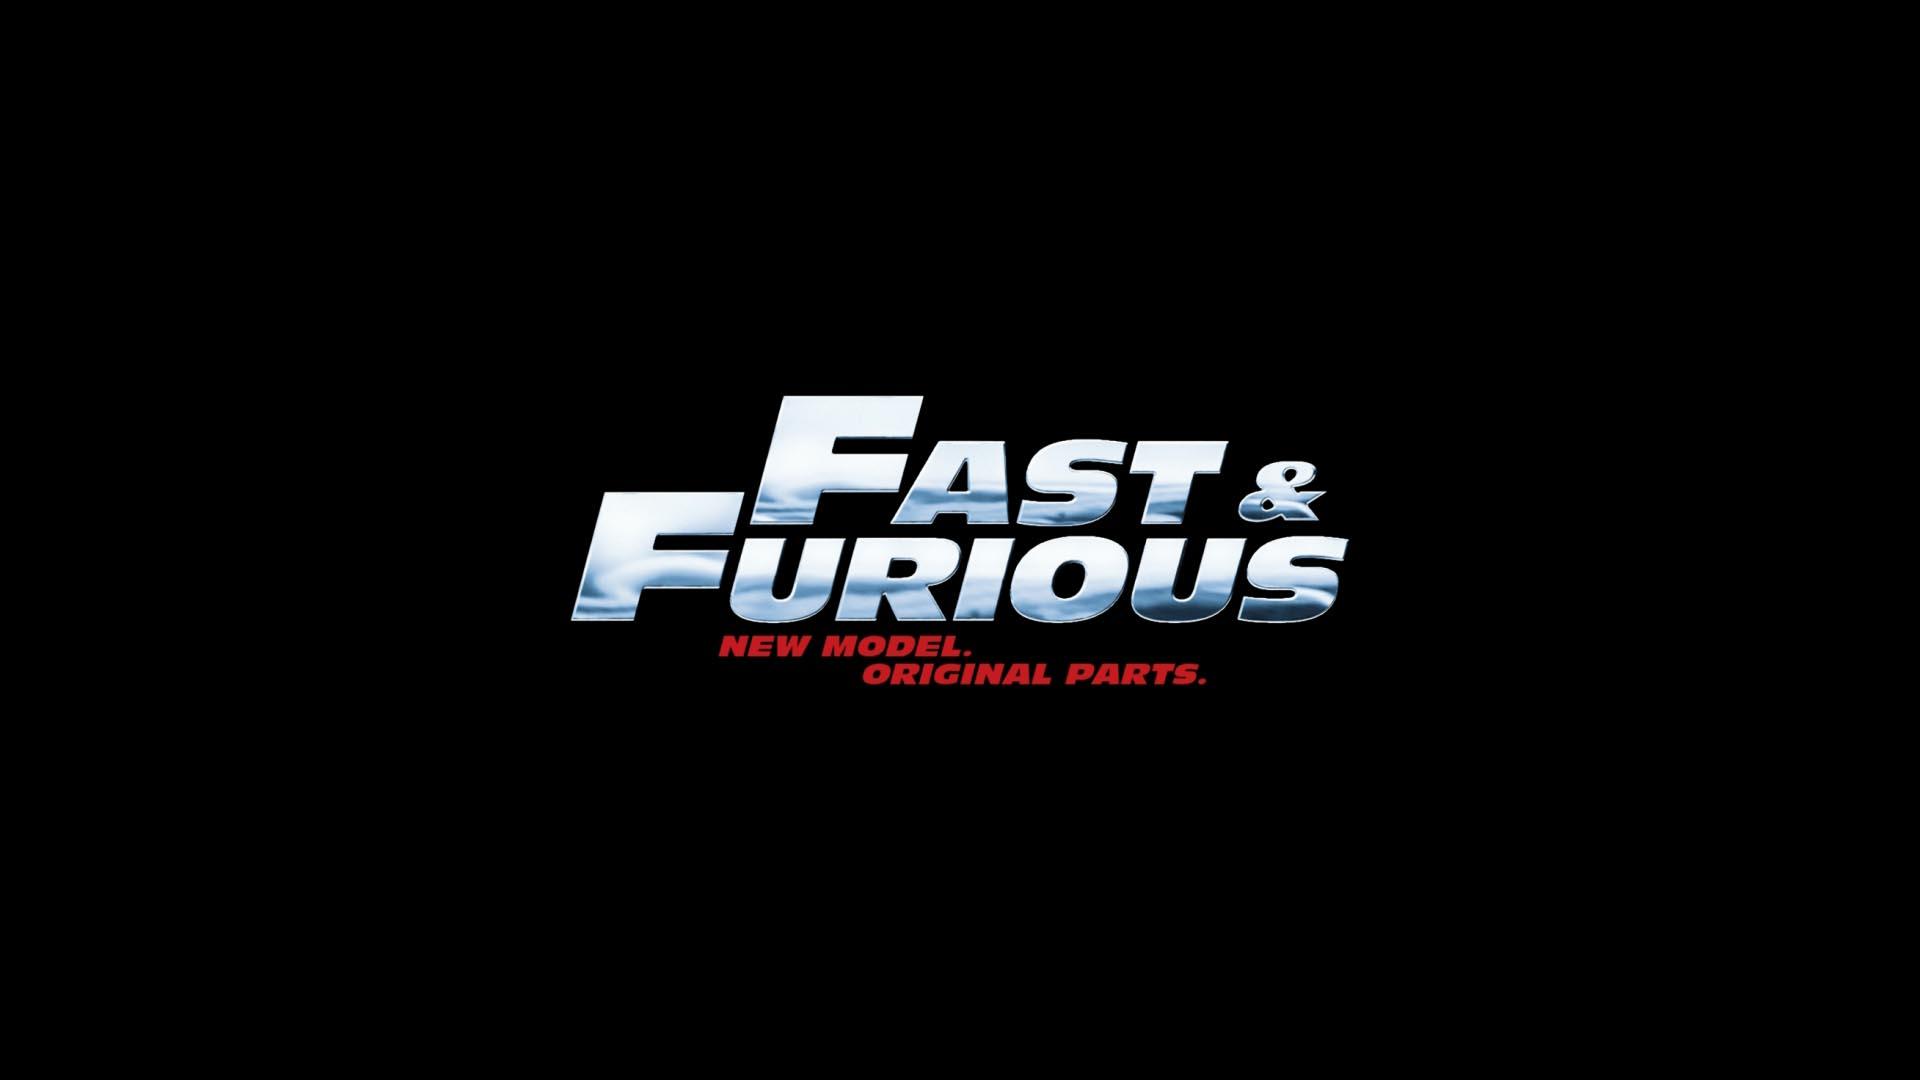 fast furious 2009 logo hd wallpaper. Black Bedroom Furniture Sets. Home Design Ideas